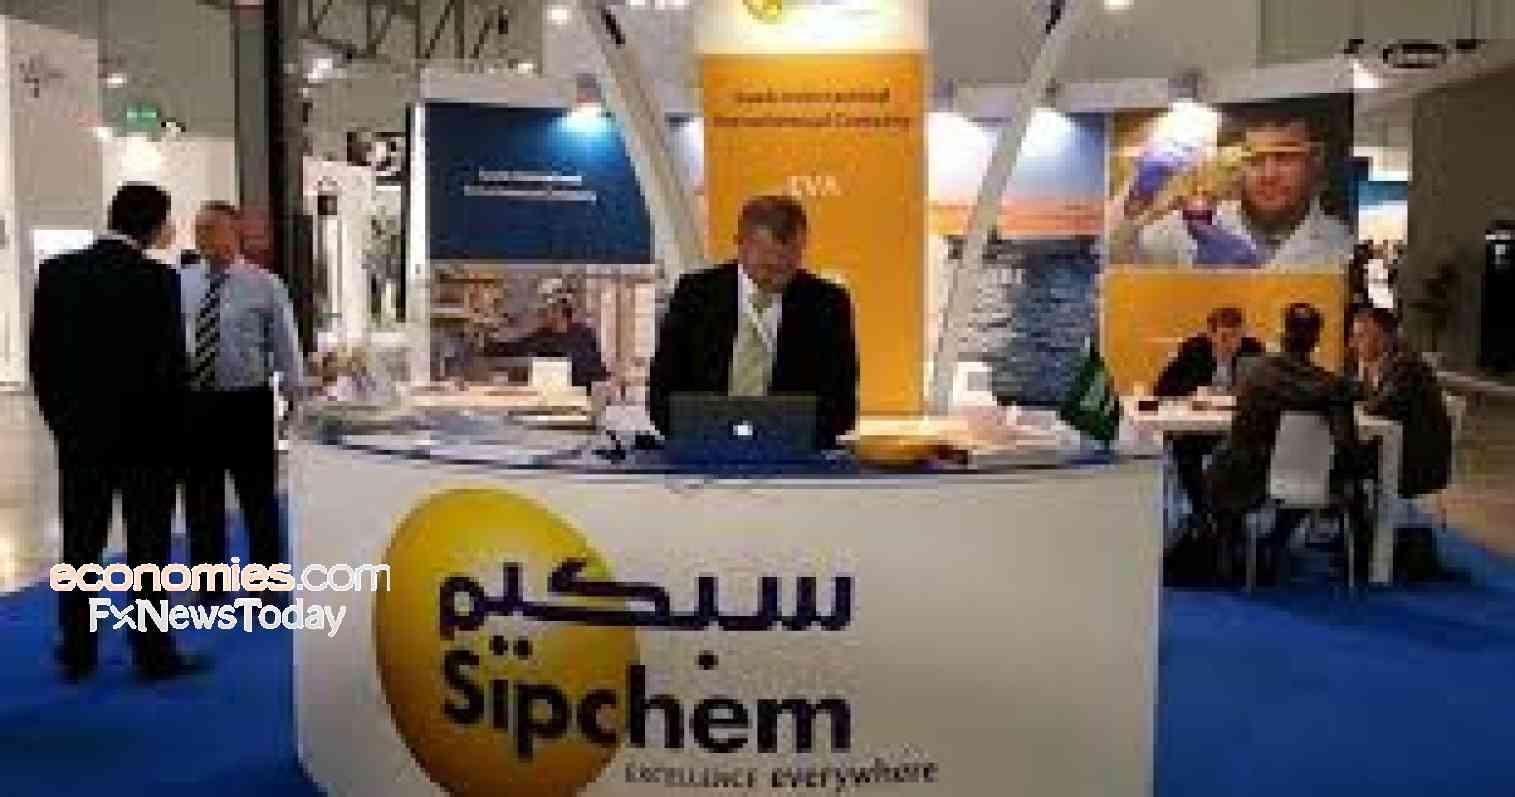 Sipchem FY18 profit rises 33% on higher revenues